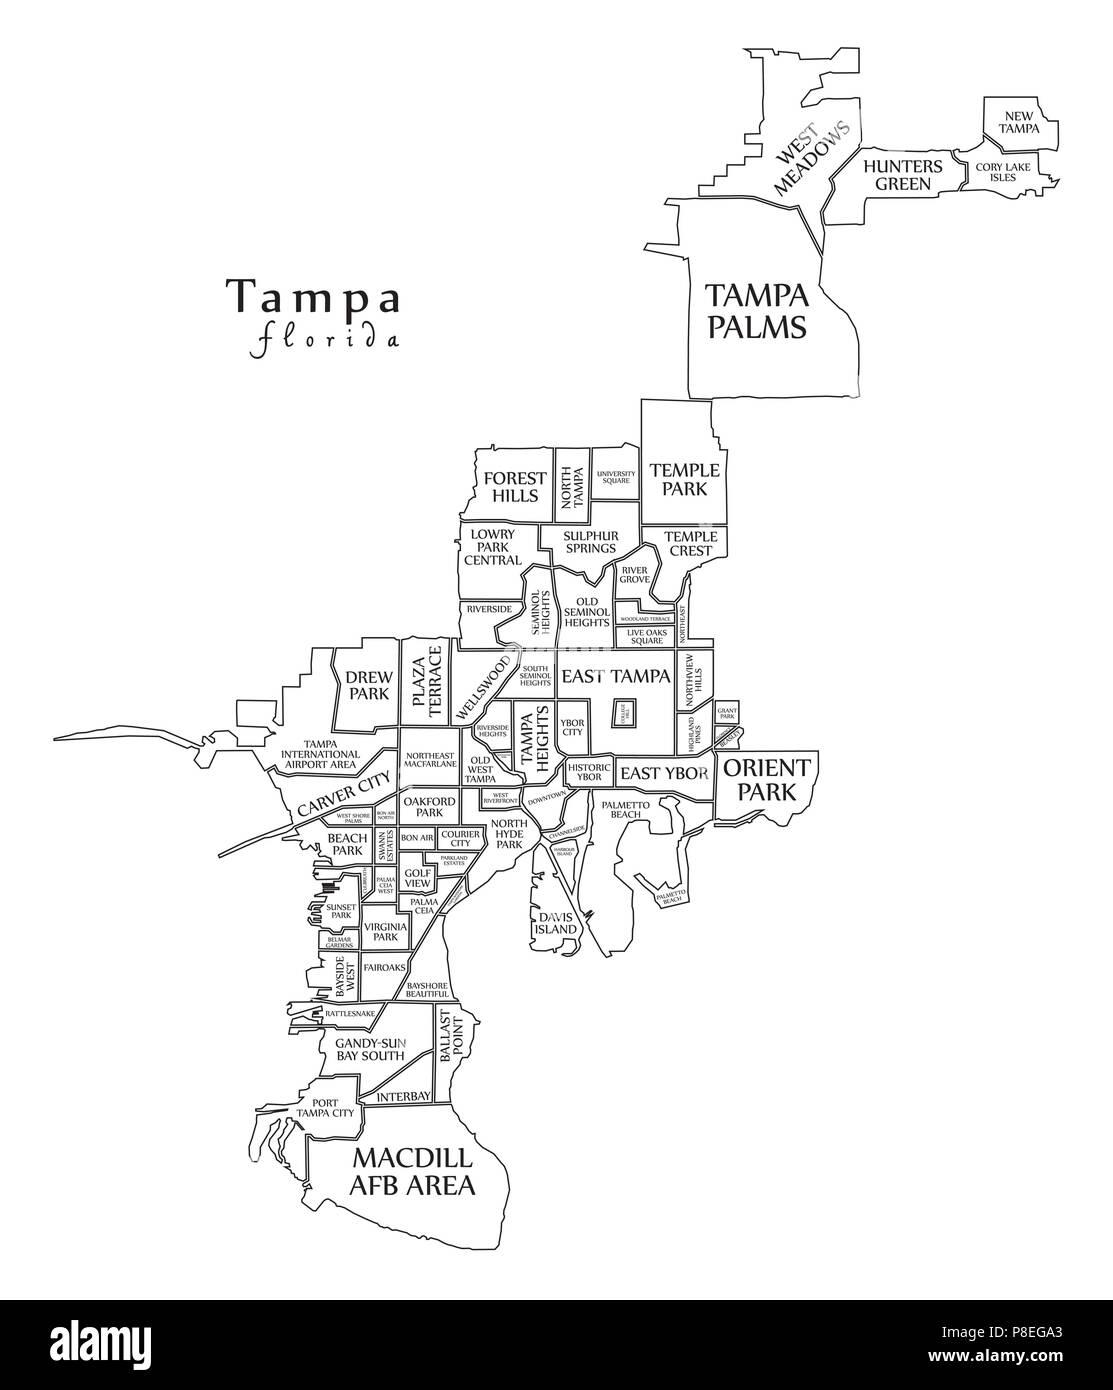 Map Of Tampa Florida Area.Modern City Map Tampa Florida City Of The Usa With Neighborhoods